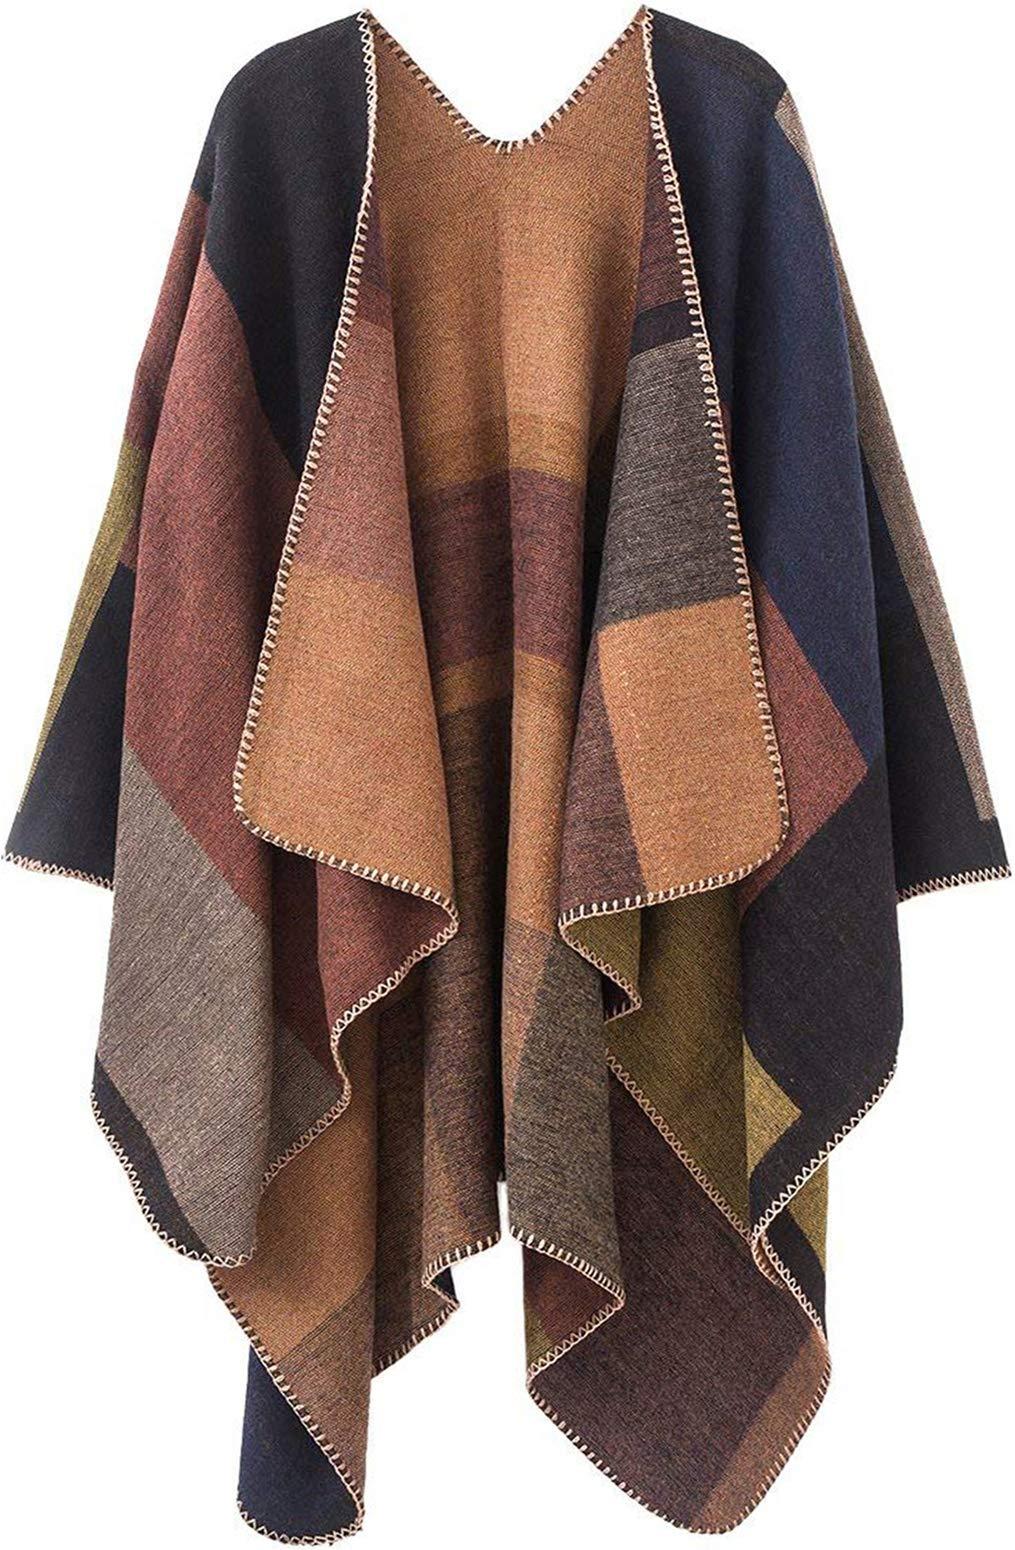 Women Plaid Shawls and Wraps,Winter Poncho Cape,Soft Cashmere Cloak,Oversized Long Cardigan Sweaters(Khaki) by KirGiabo